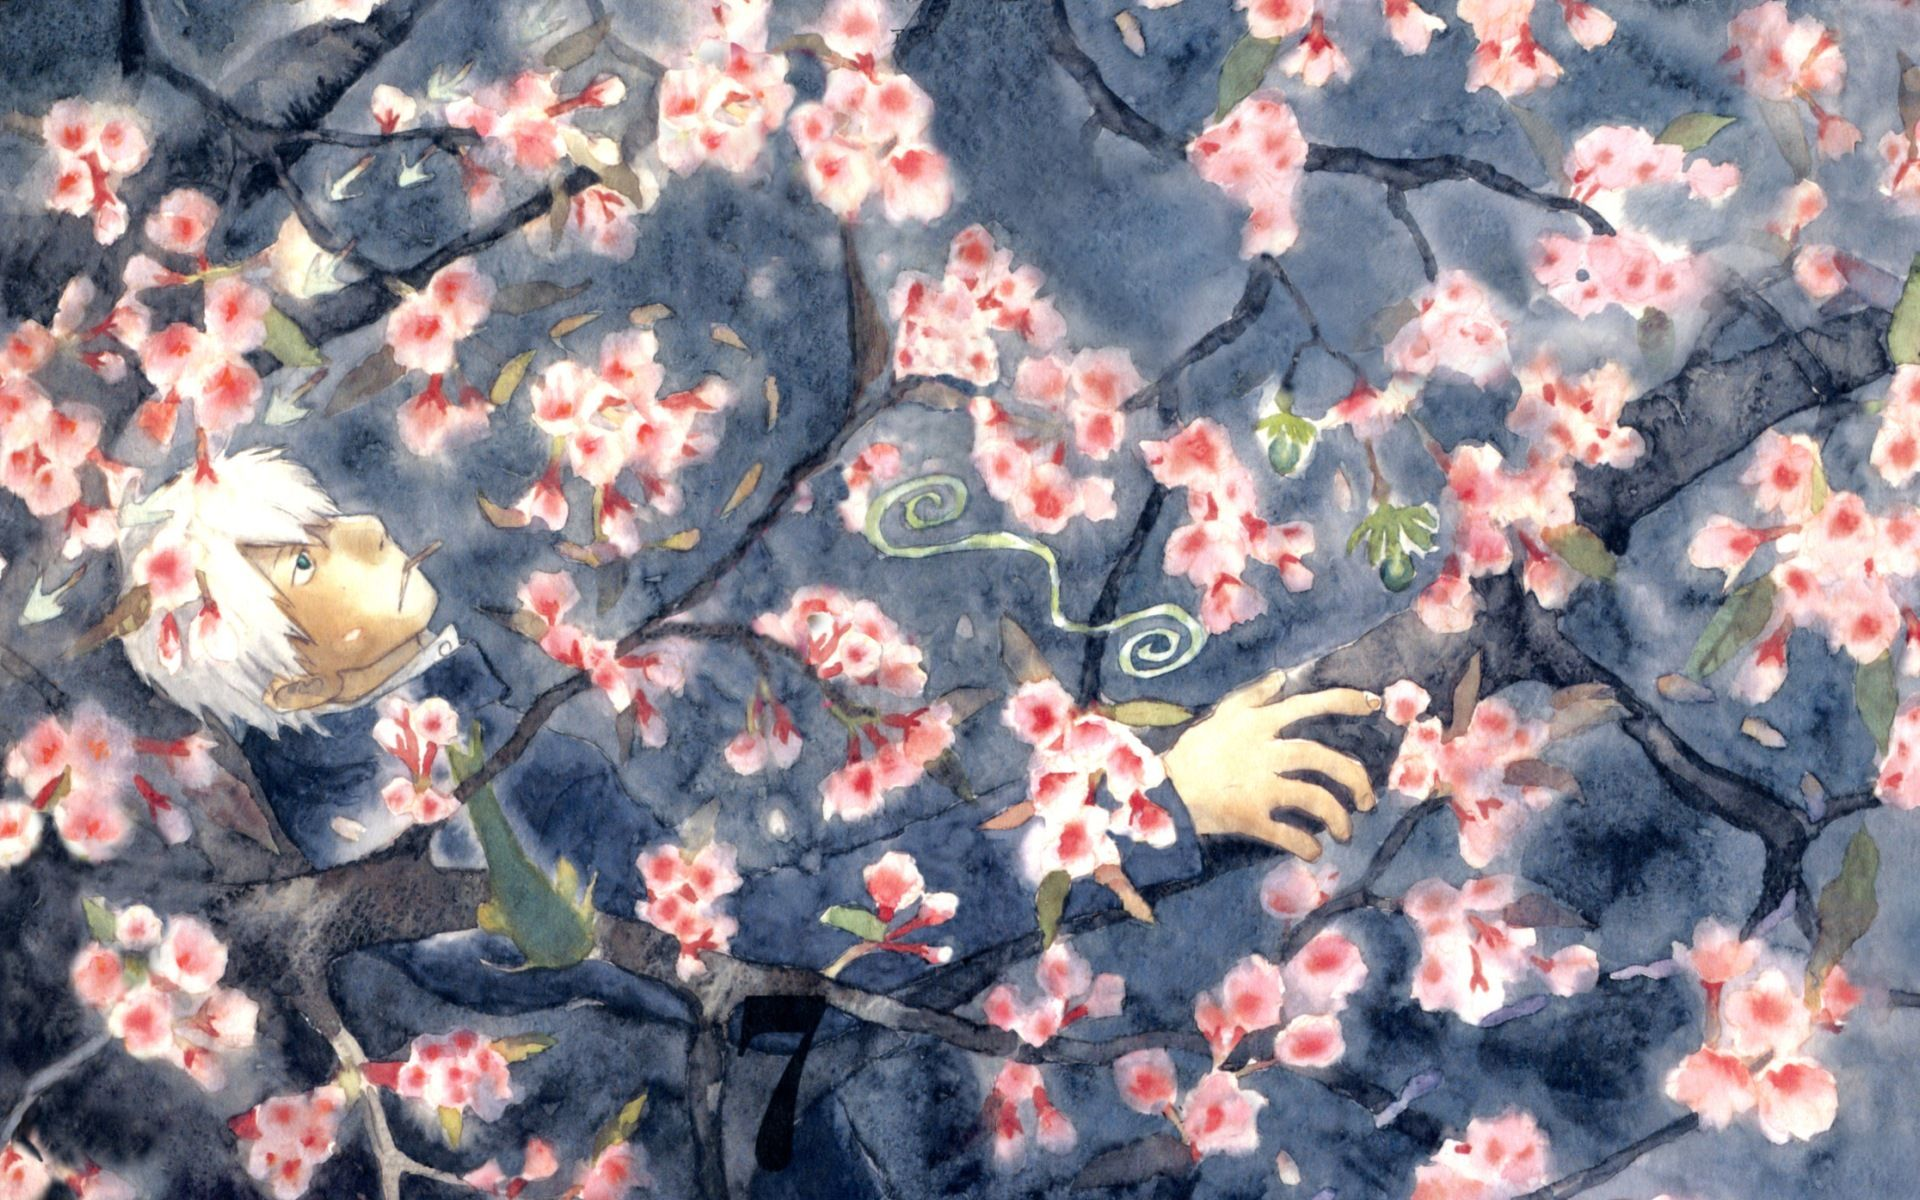 Mushishi Wallpapers Geeky art, Anime, Anime images